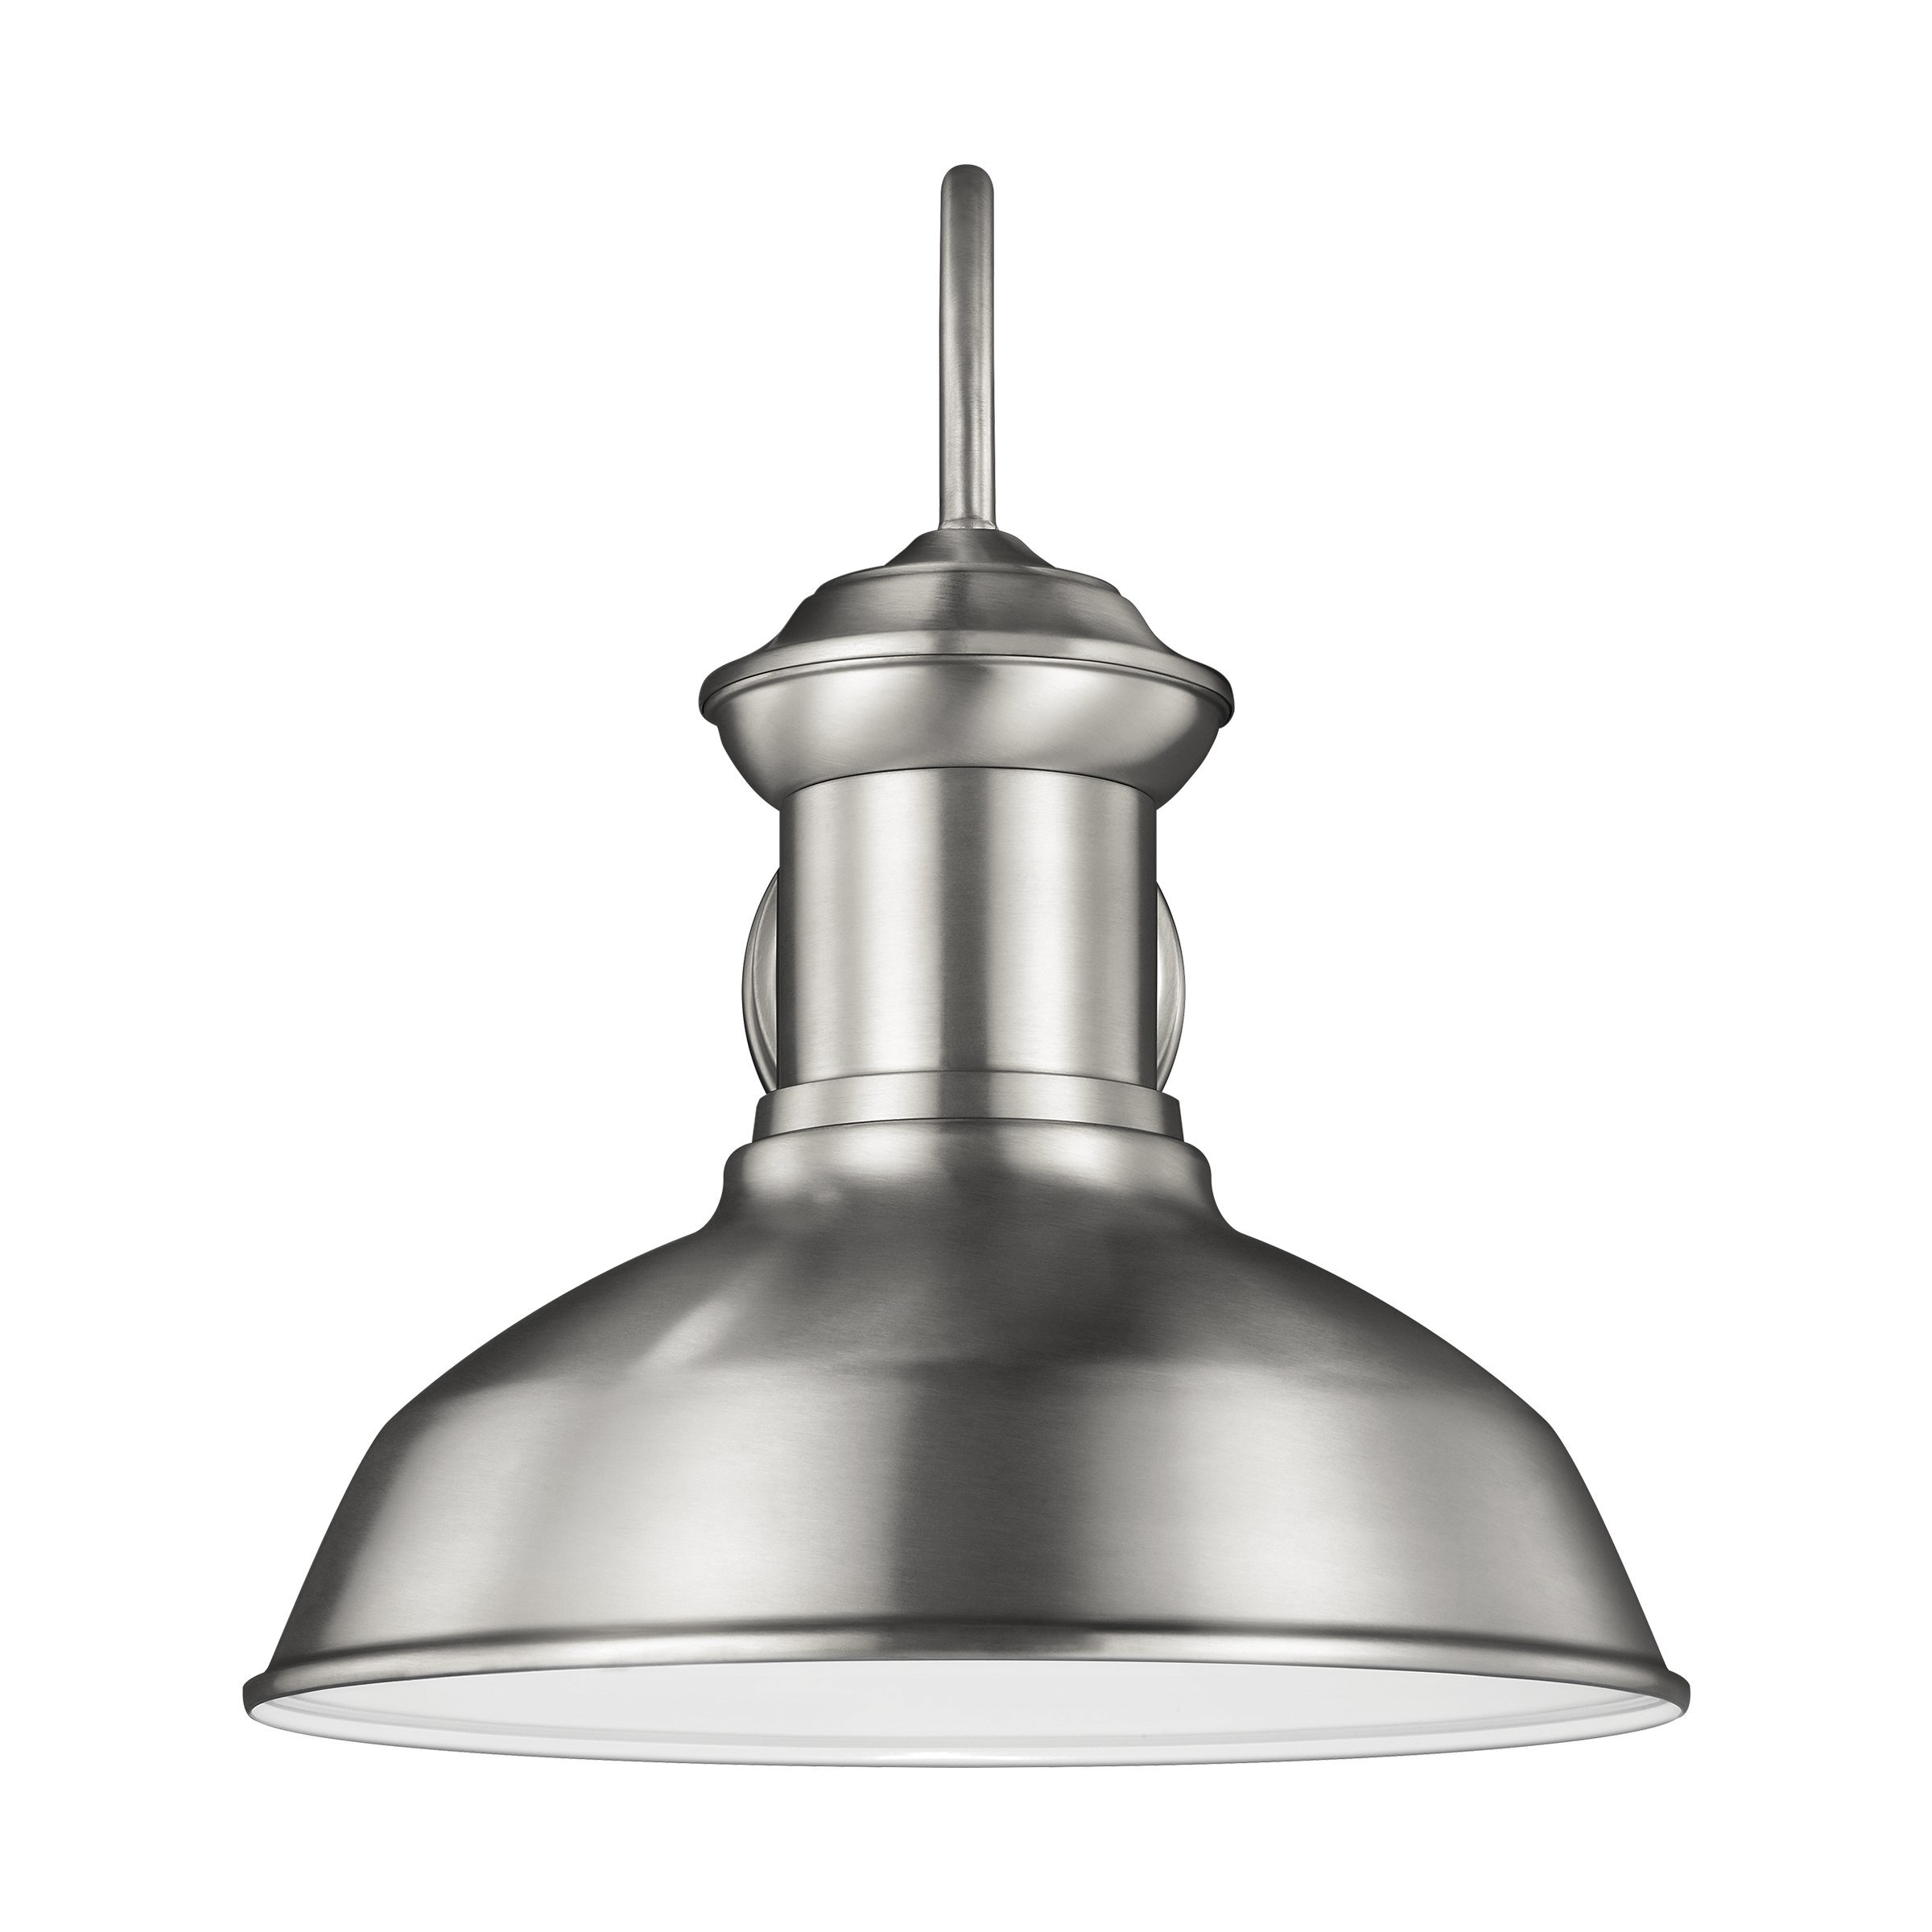 Sea Gull Lighting 8647701-04 Fredricksburg One-Light Outdoor Wall Lantern, Satin Aluminum Finish